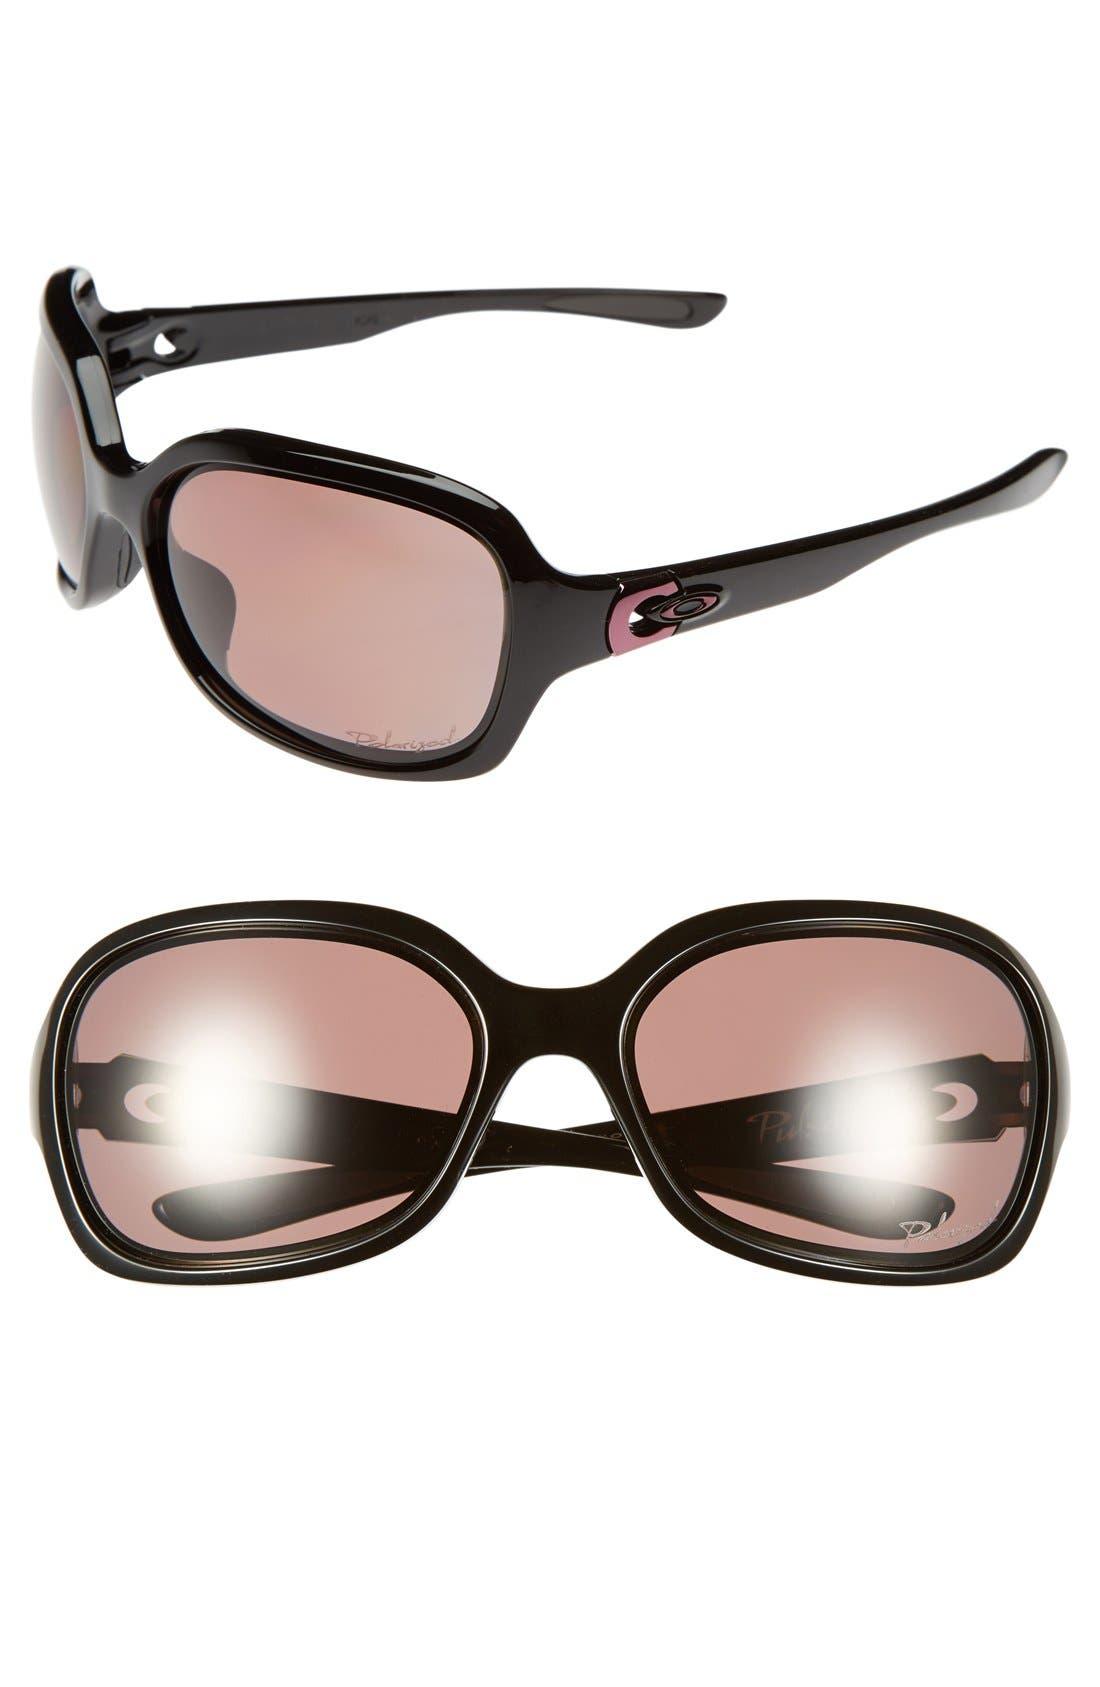 Alternate Image 1 Selected - Oakley 'Pulse' 61mm Polarized Sunglasses